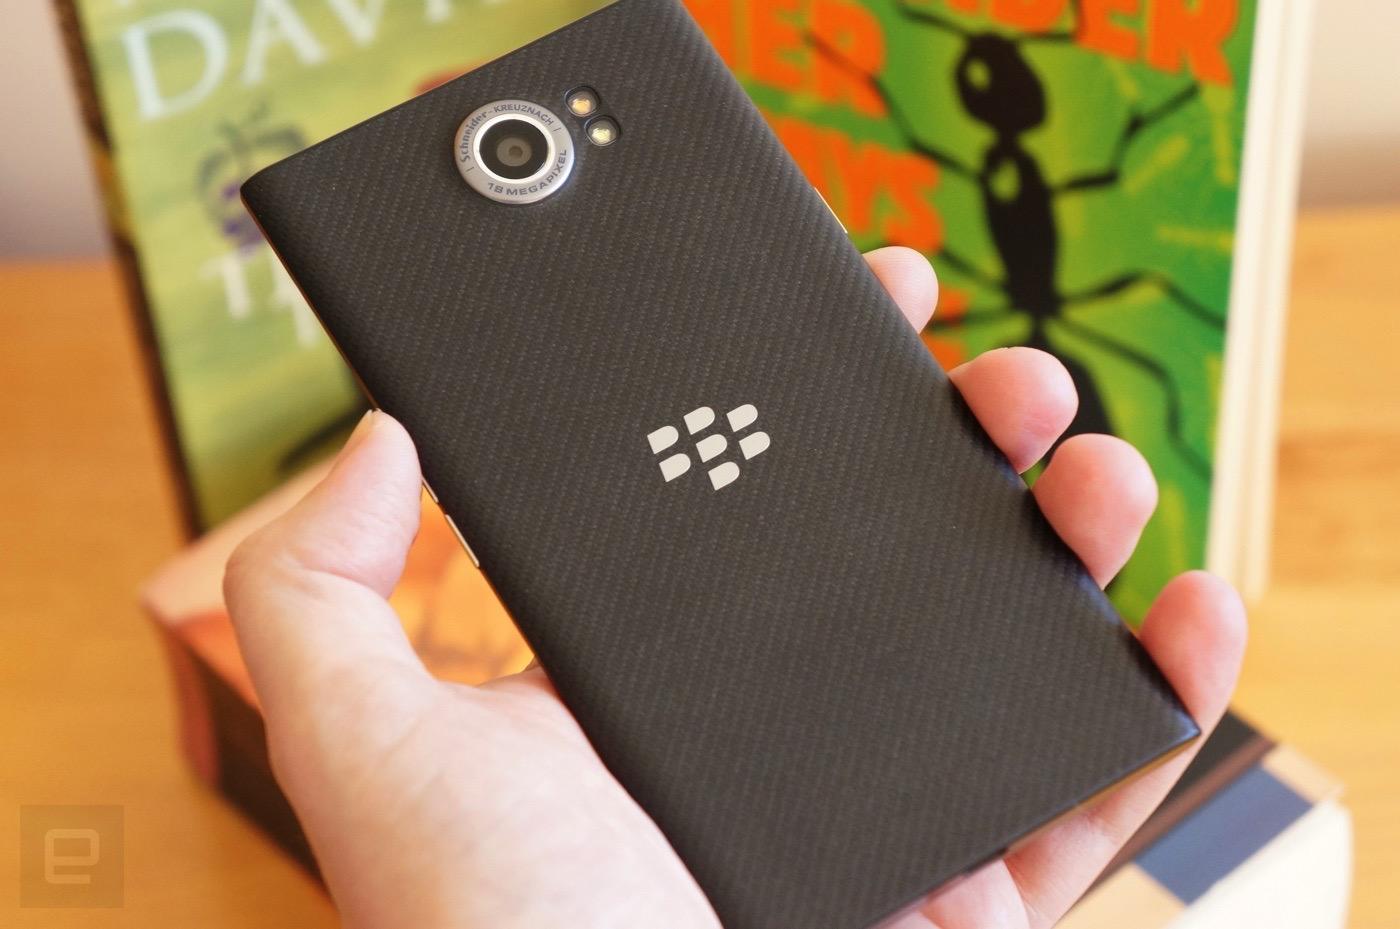 BlackBerry Priv's backside